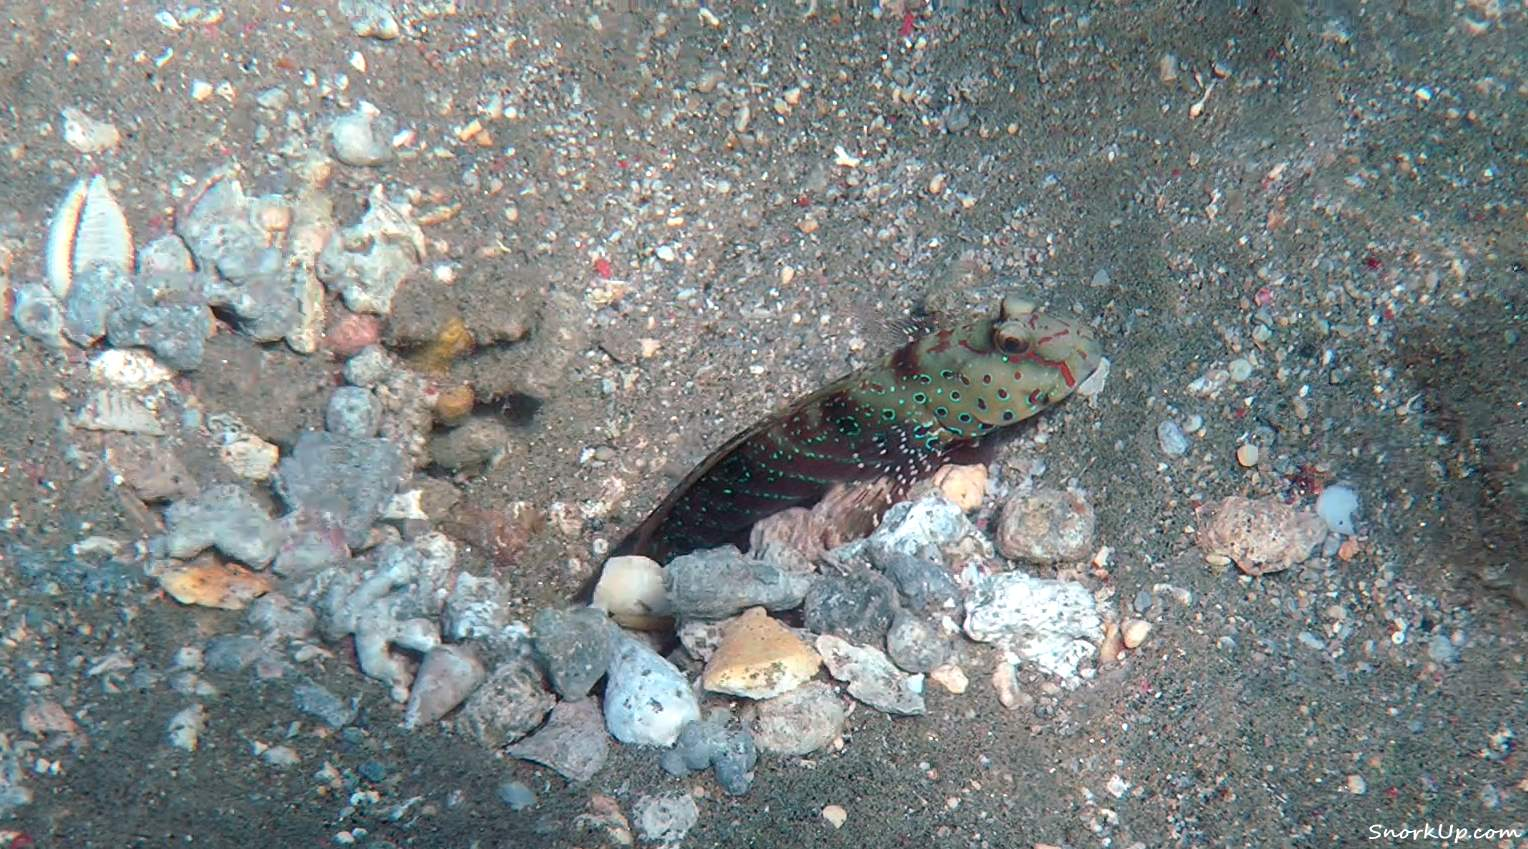 Синепятнистый бычок-компаньон (лат.Cryptocentrus caeruleopunctatus, анг.Harlequin prawn-goby)